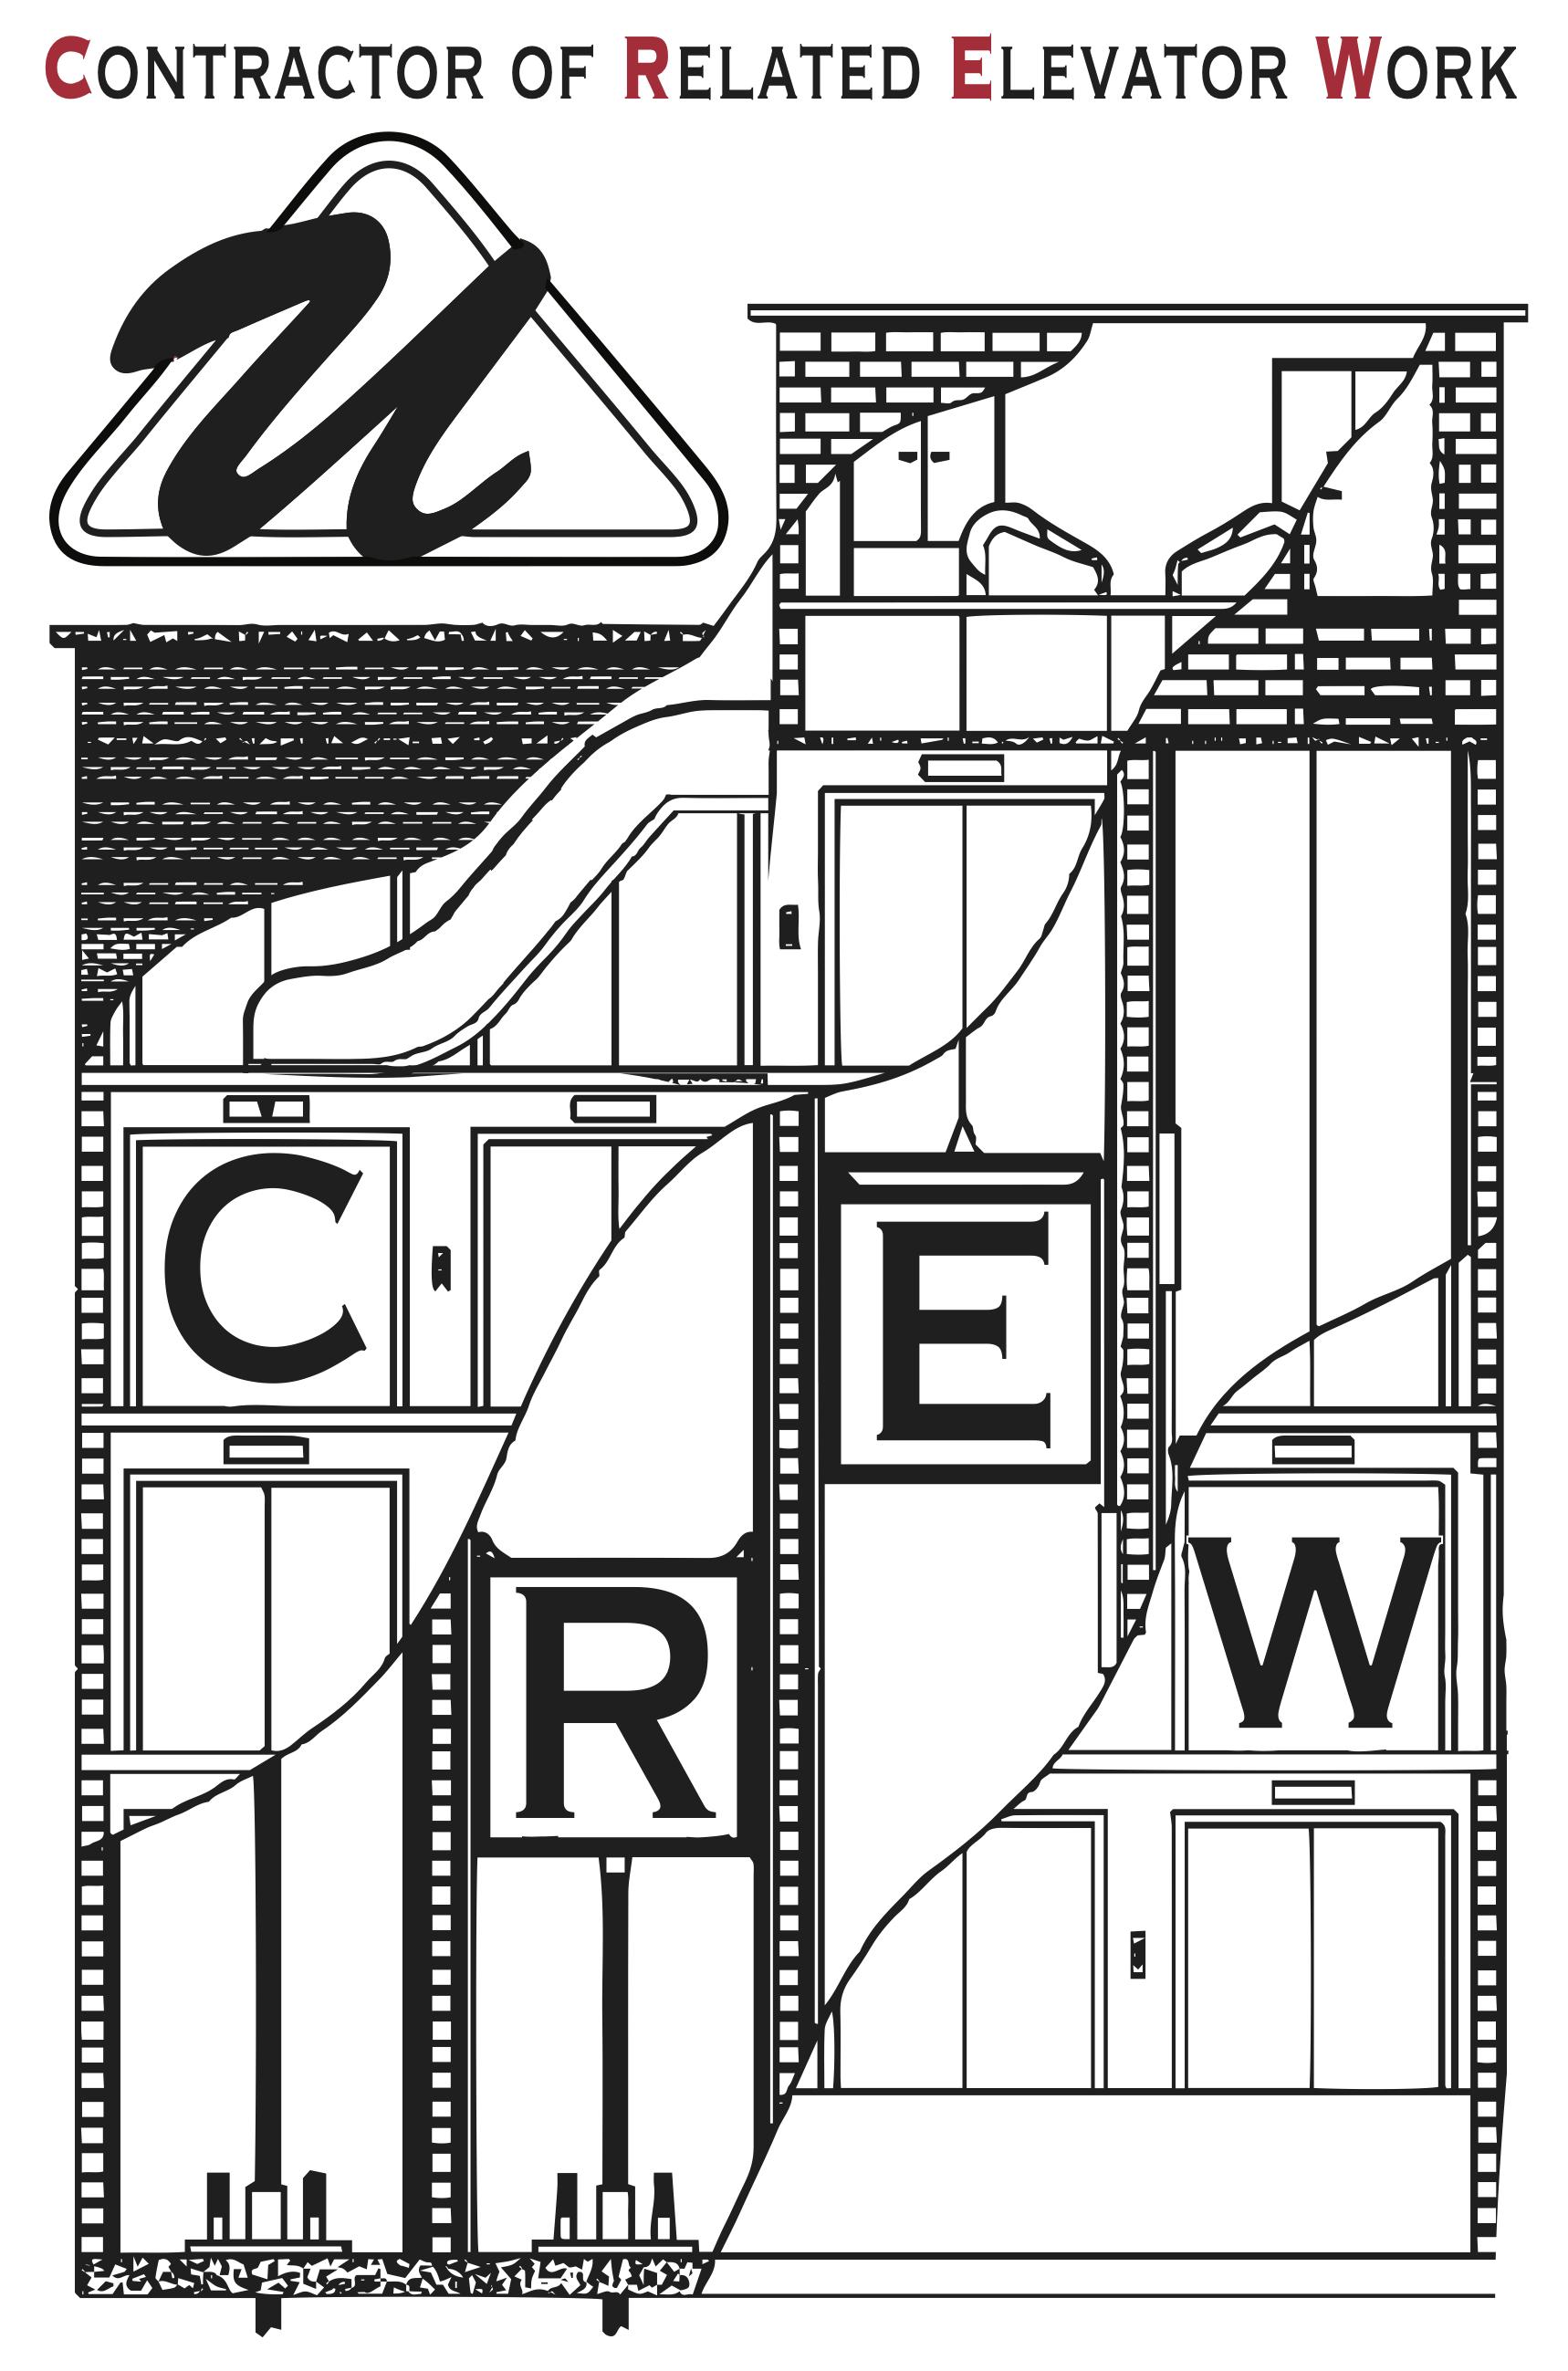 CREWdesign1.png